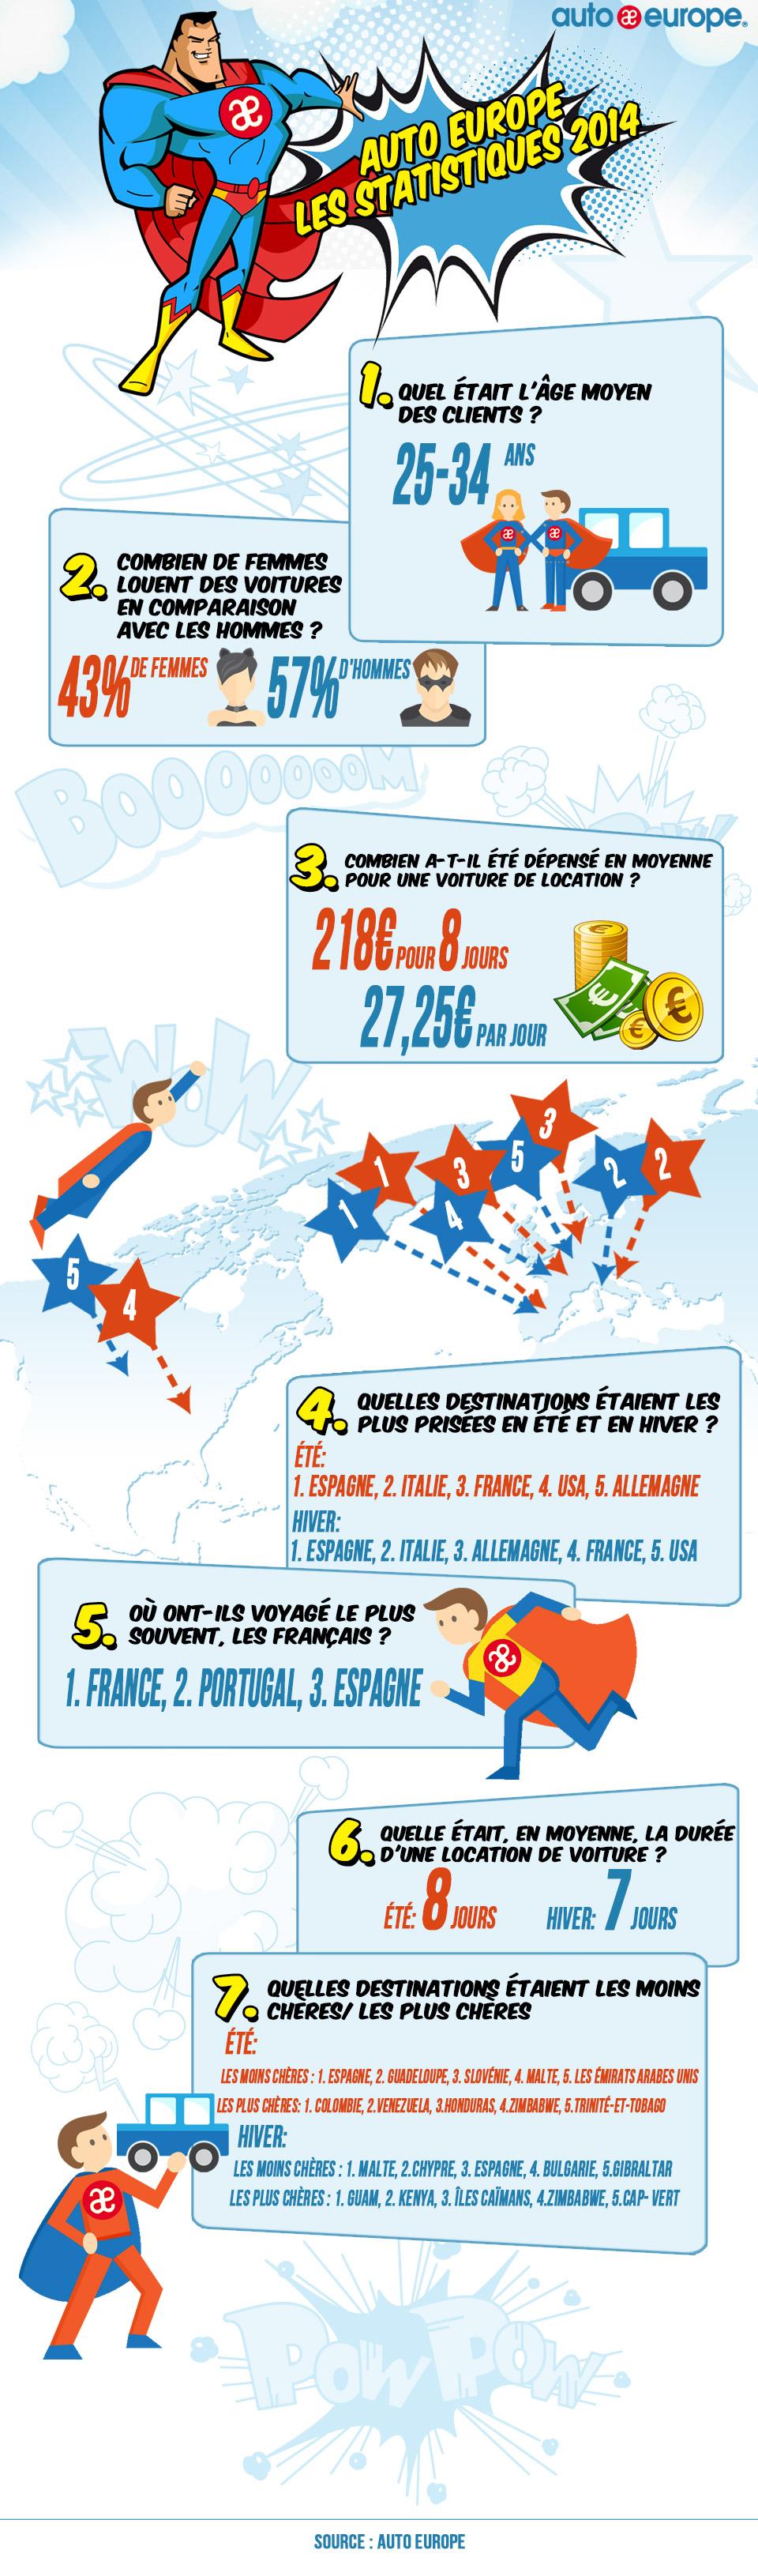 Statistiques Auto Europe